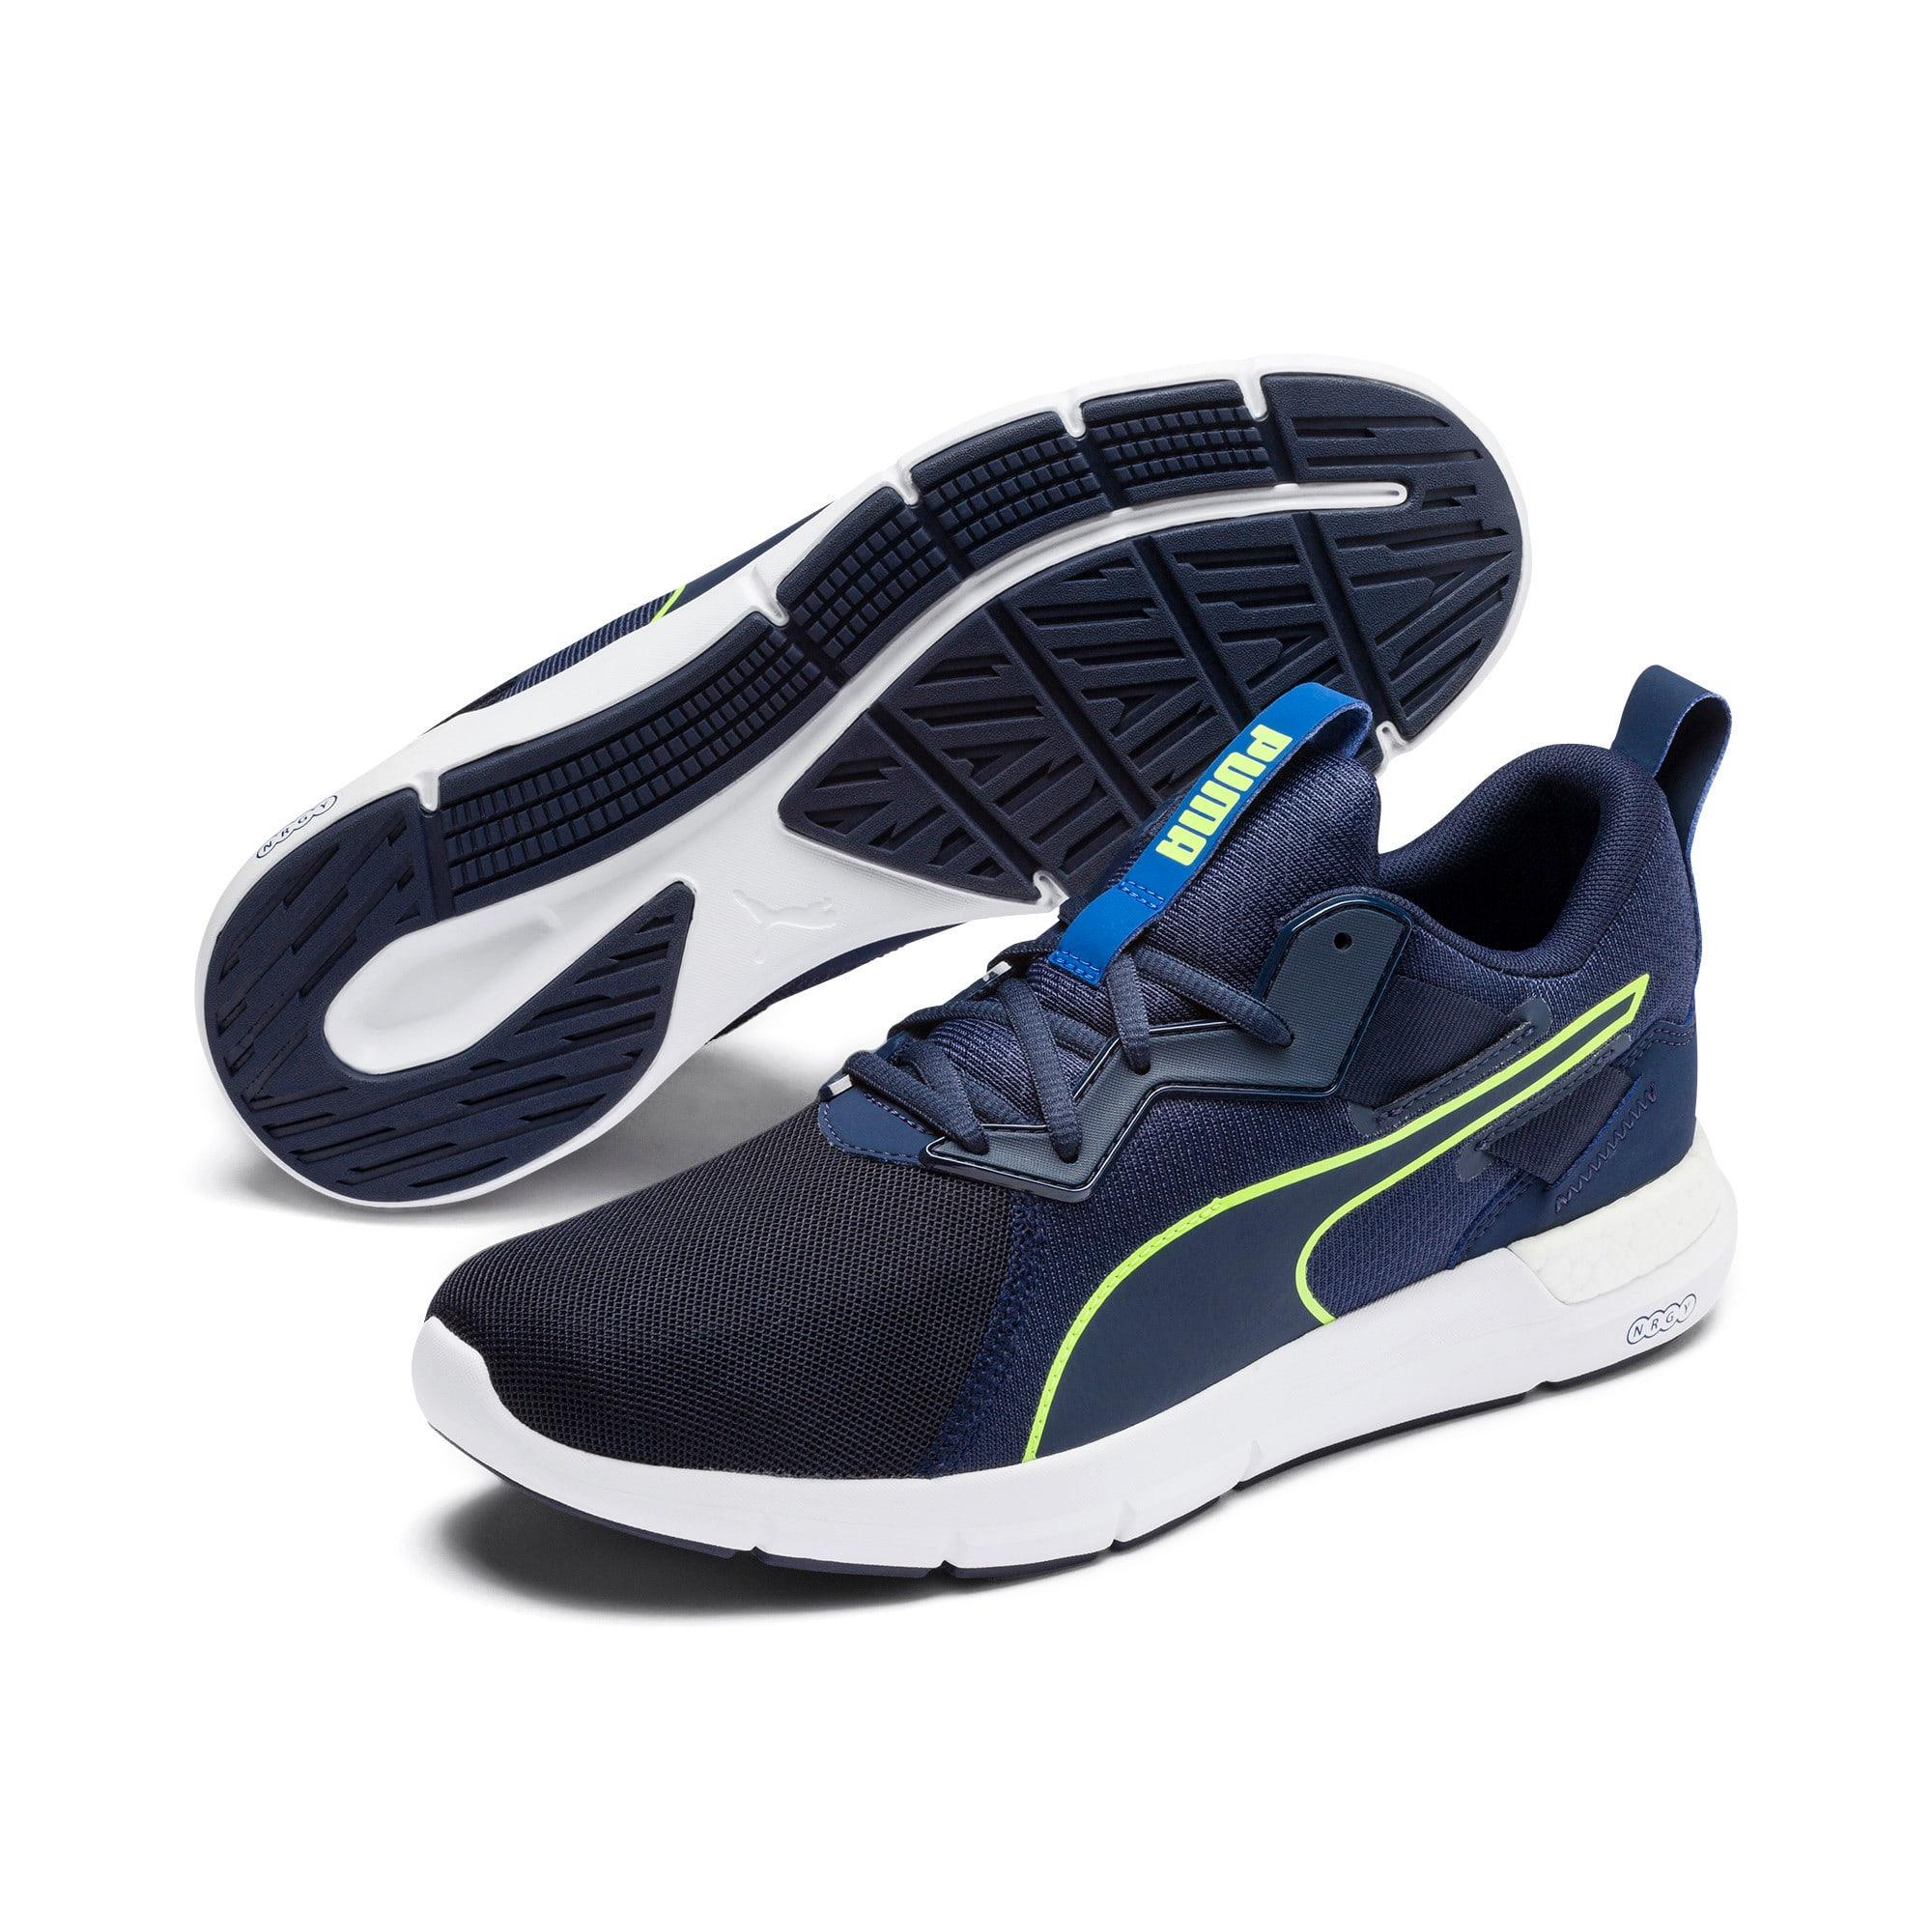 Thumbnail 2 of NRGY Dynamo Futuro Men's Running Shoes, Peacoat-Puma White, medium